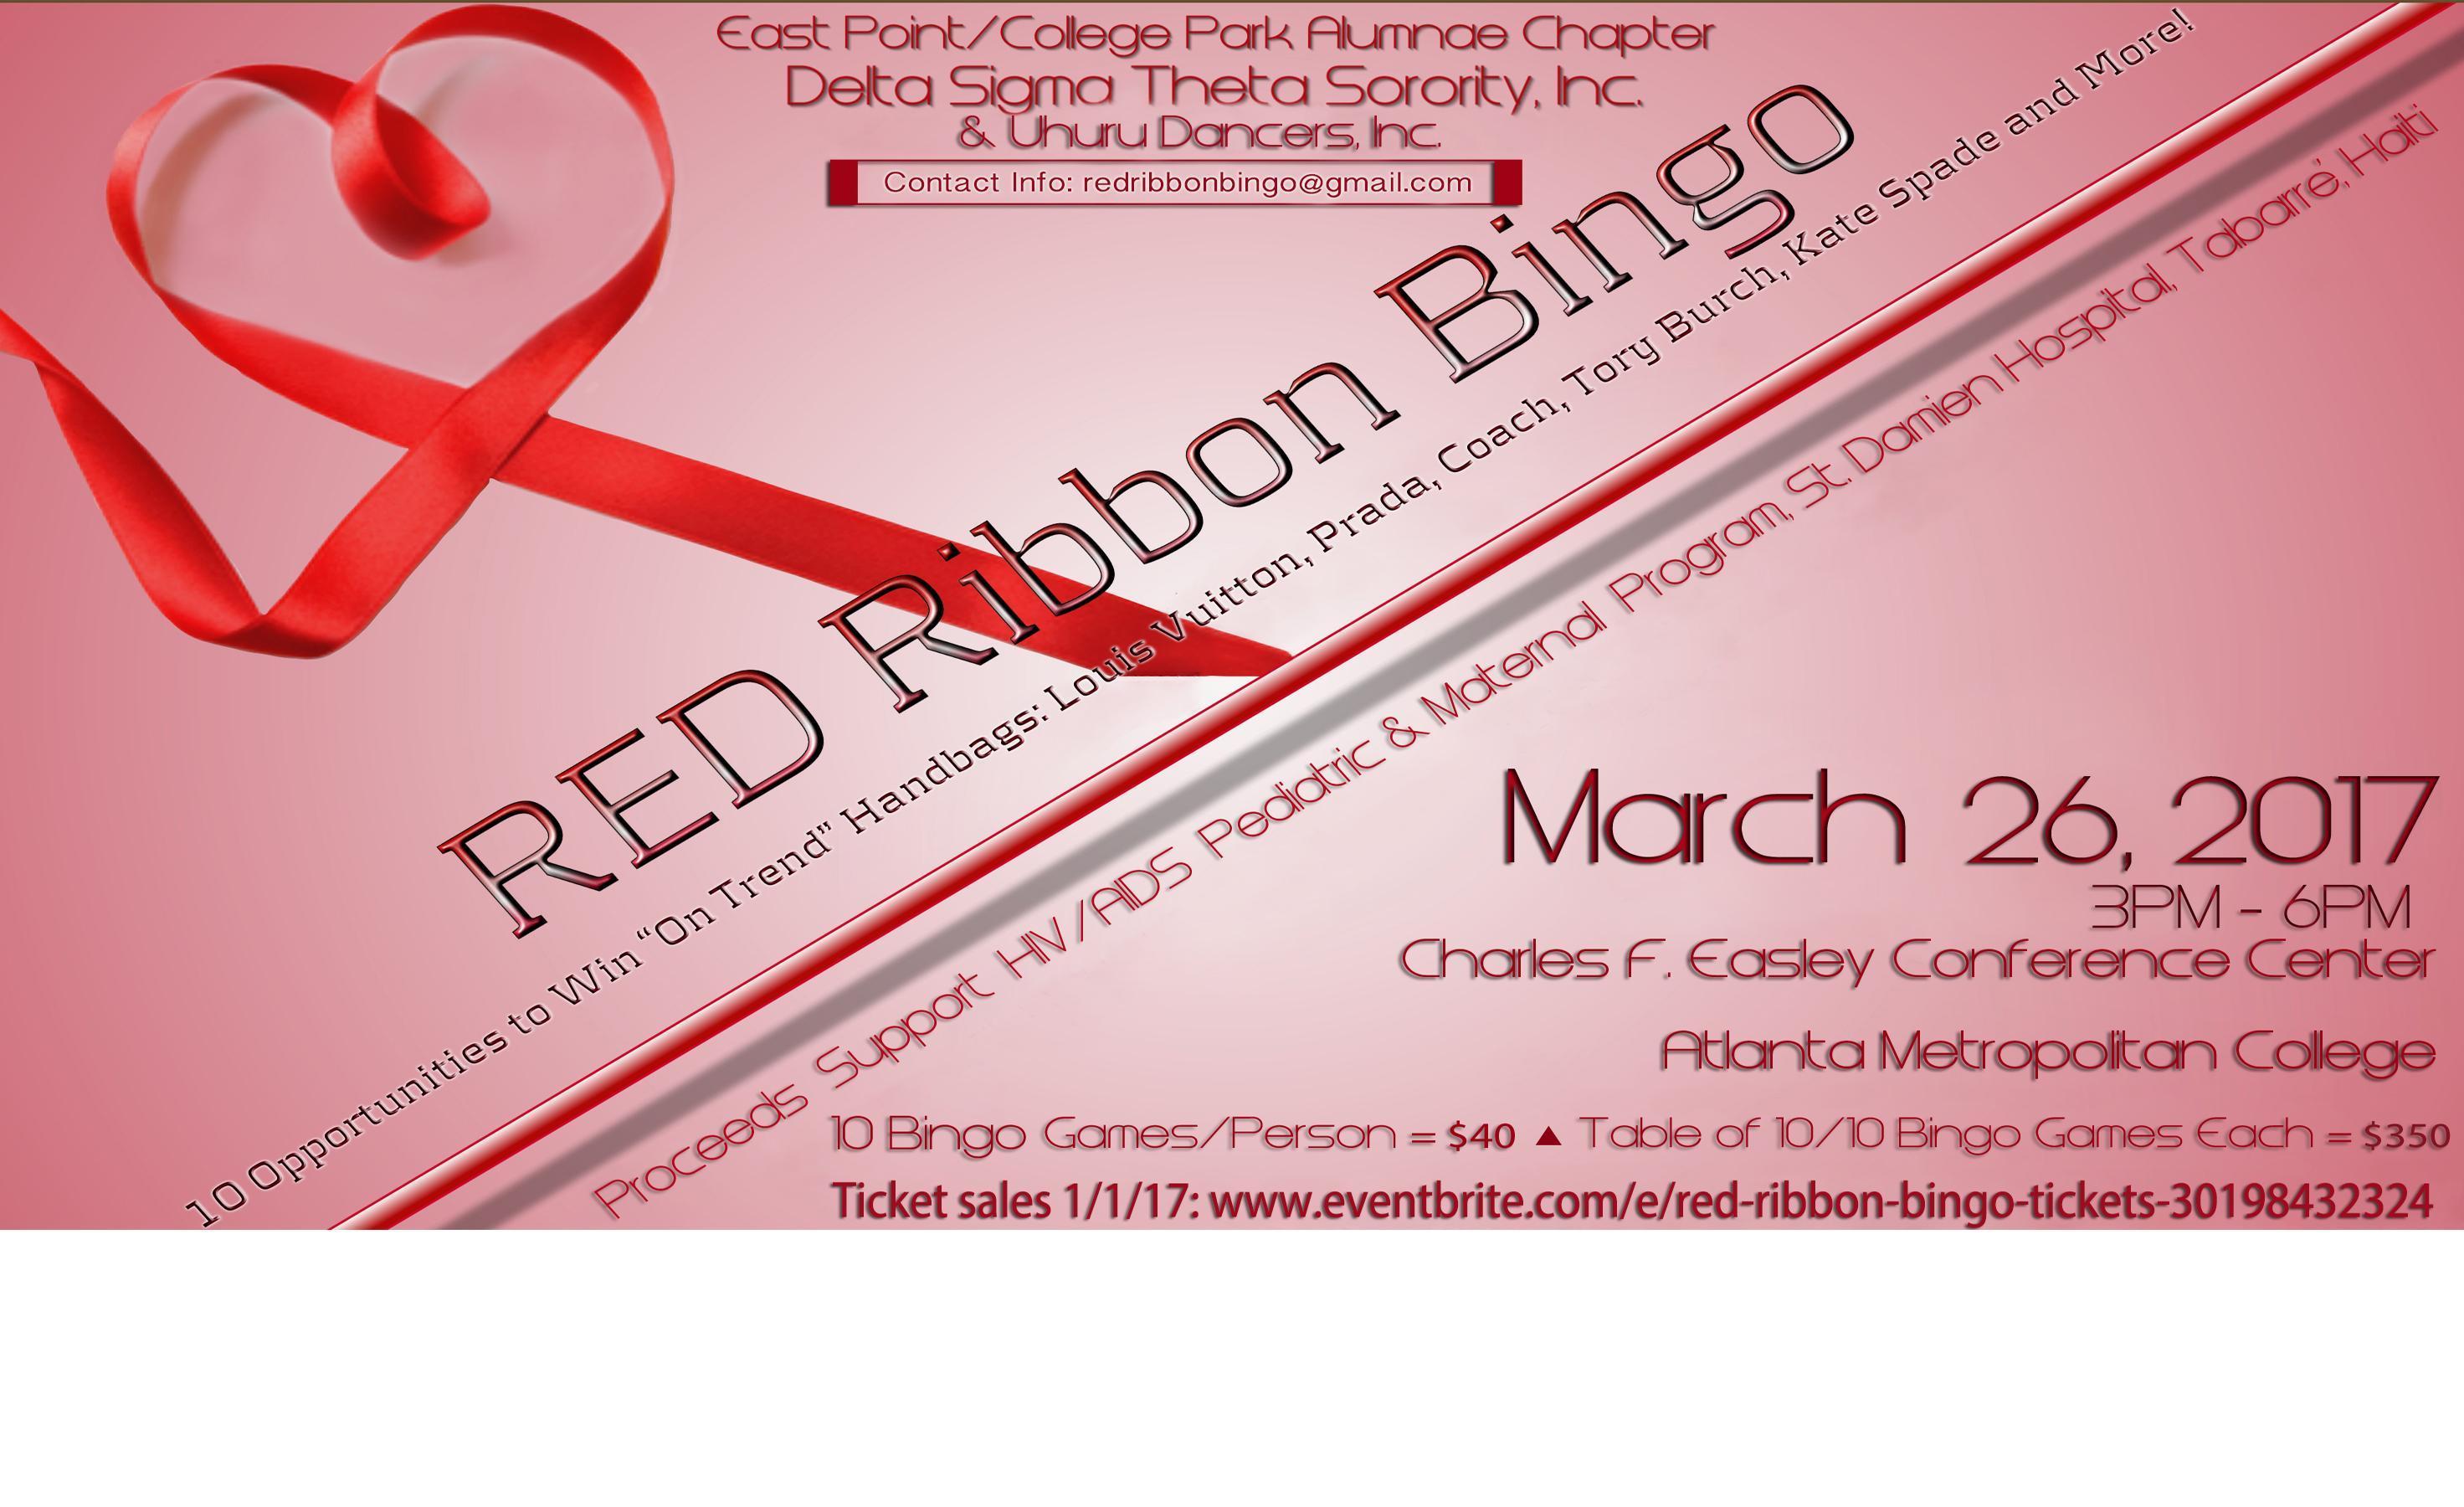 Red Ribbon Bingo